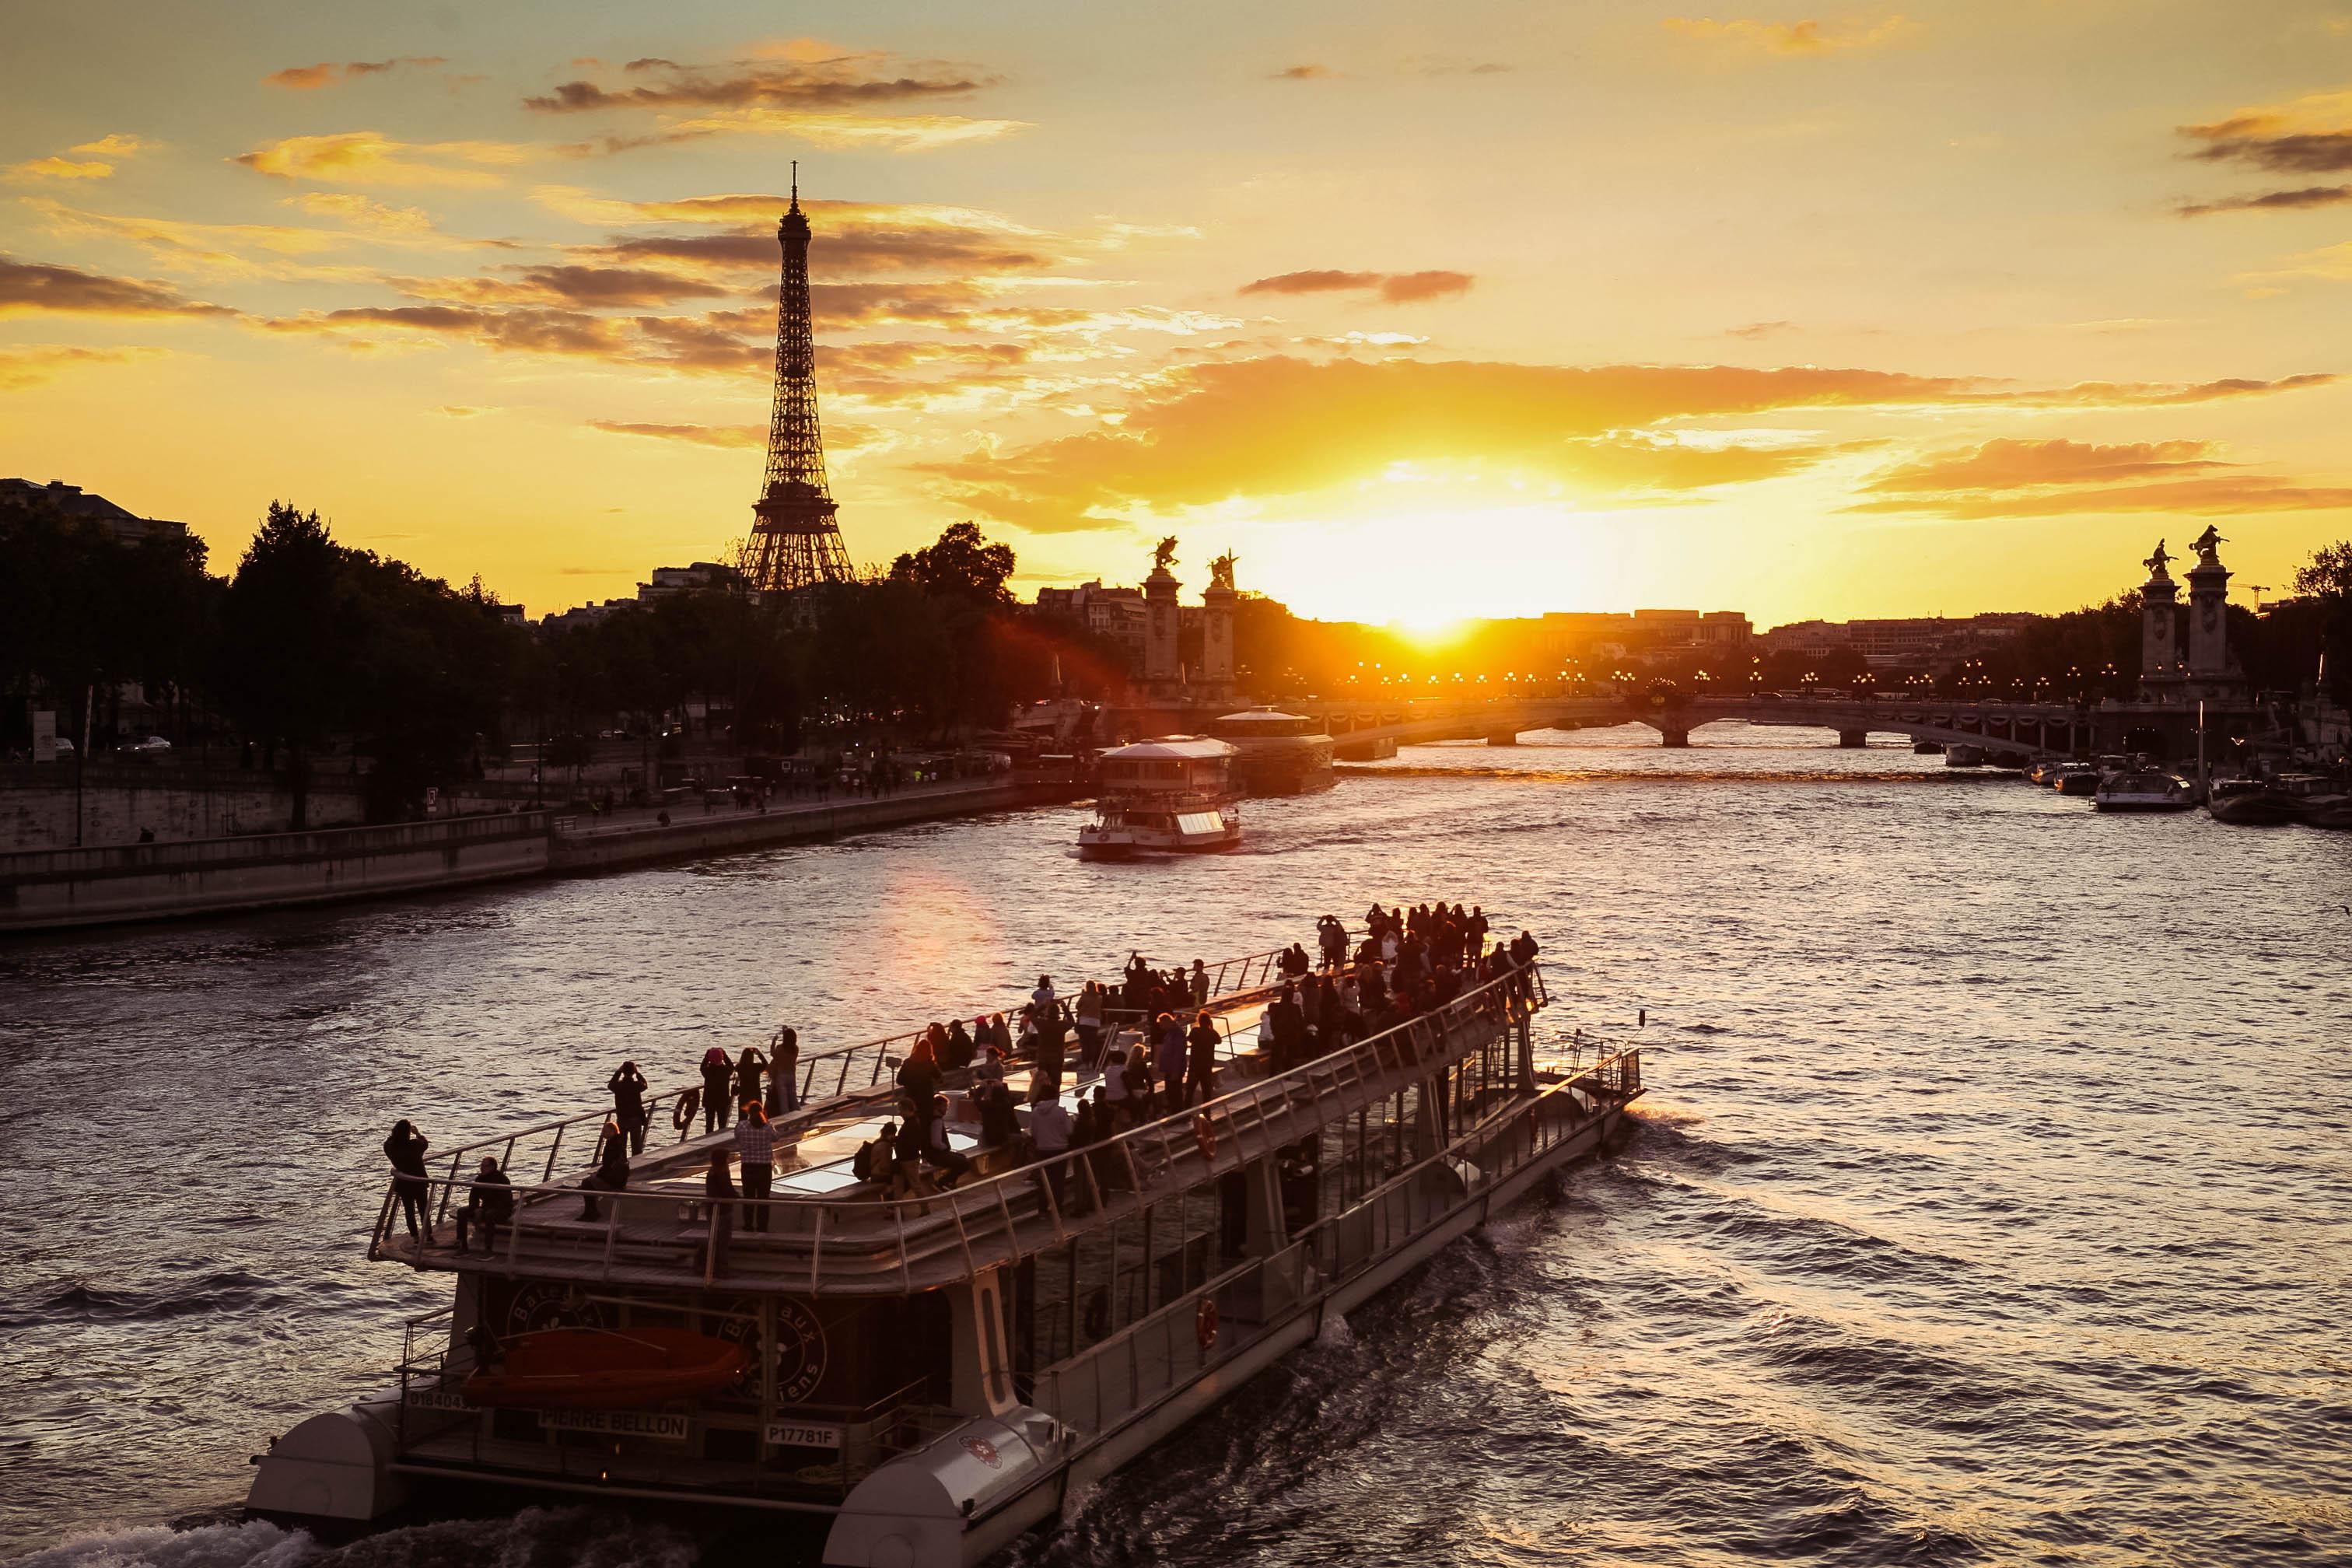 La Seine - Bateaux Parisiens CRT IDF%252FATF%252FLiiinks%252FLaurent Derossi